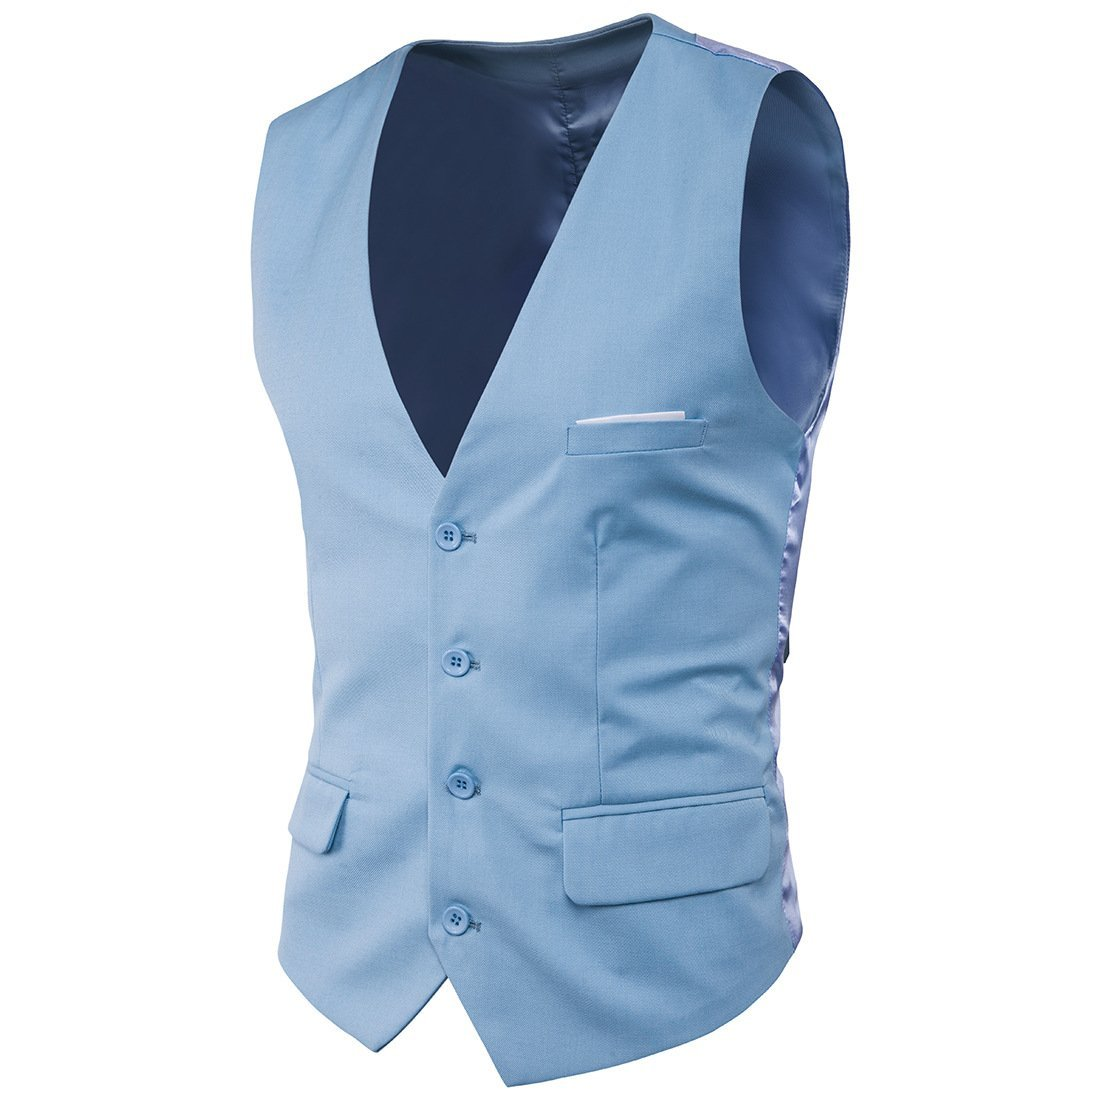 Juleya Single-Breasted Man Vest Slim V-Neck Suit Vest Male Puls Size Solid Colors Suit Vest Men B180618MW6-J